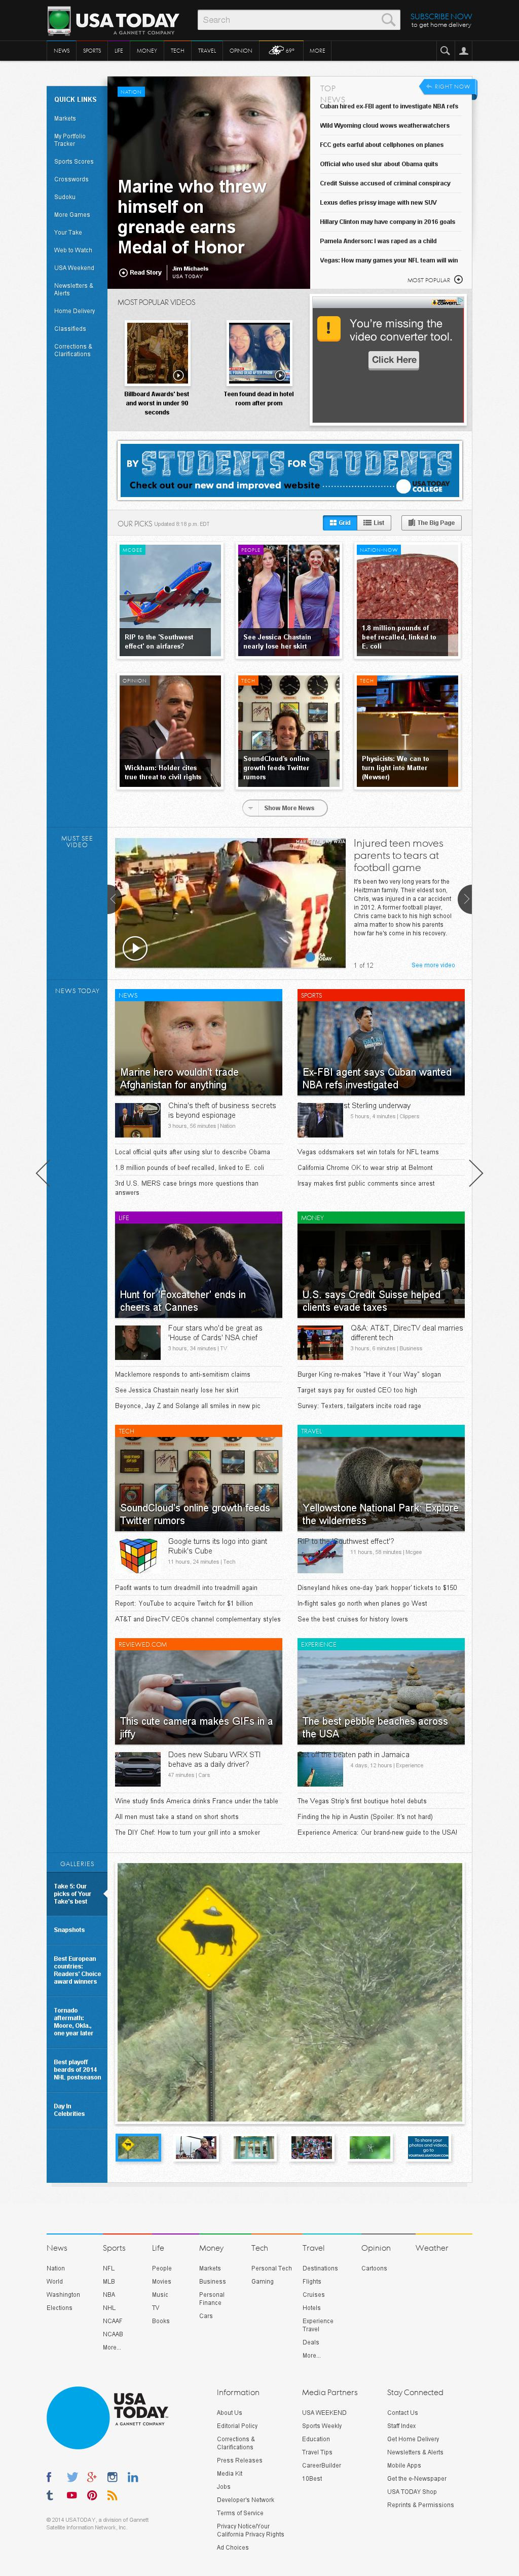 USA Today at Tuesday May 20, 2014, 12:24 a.m. UTC